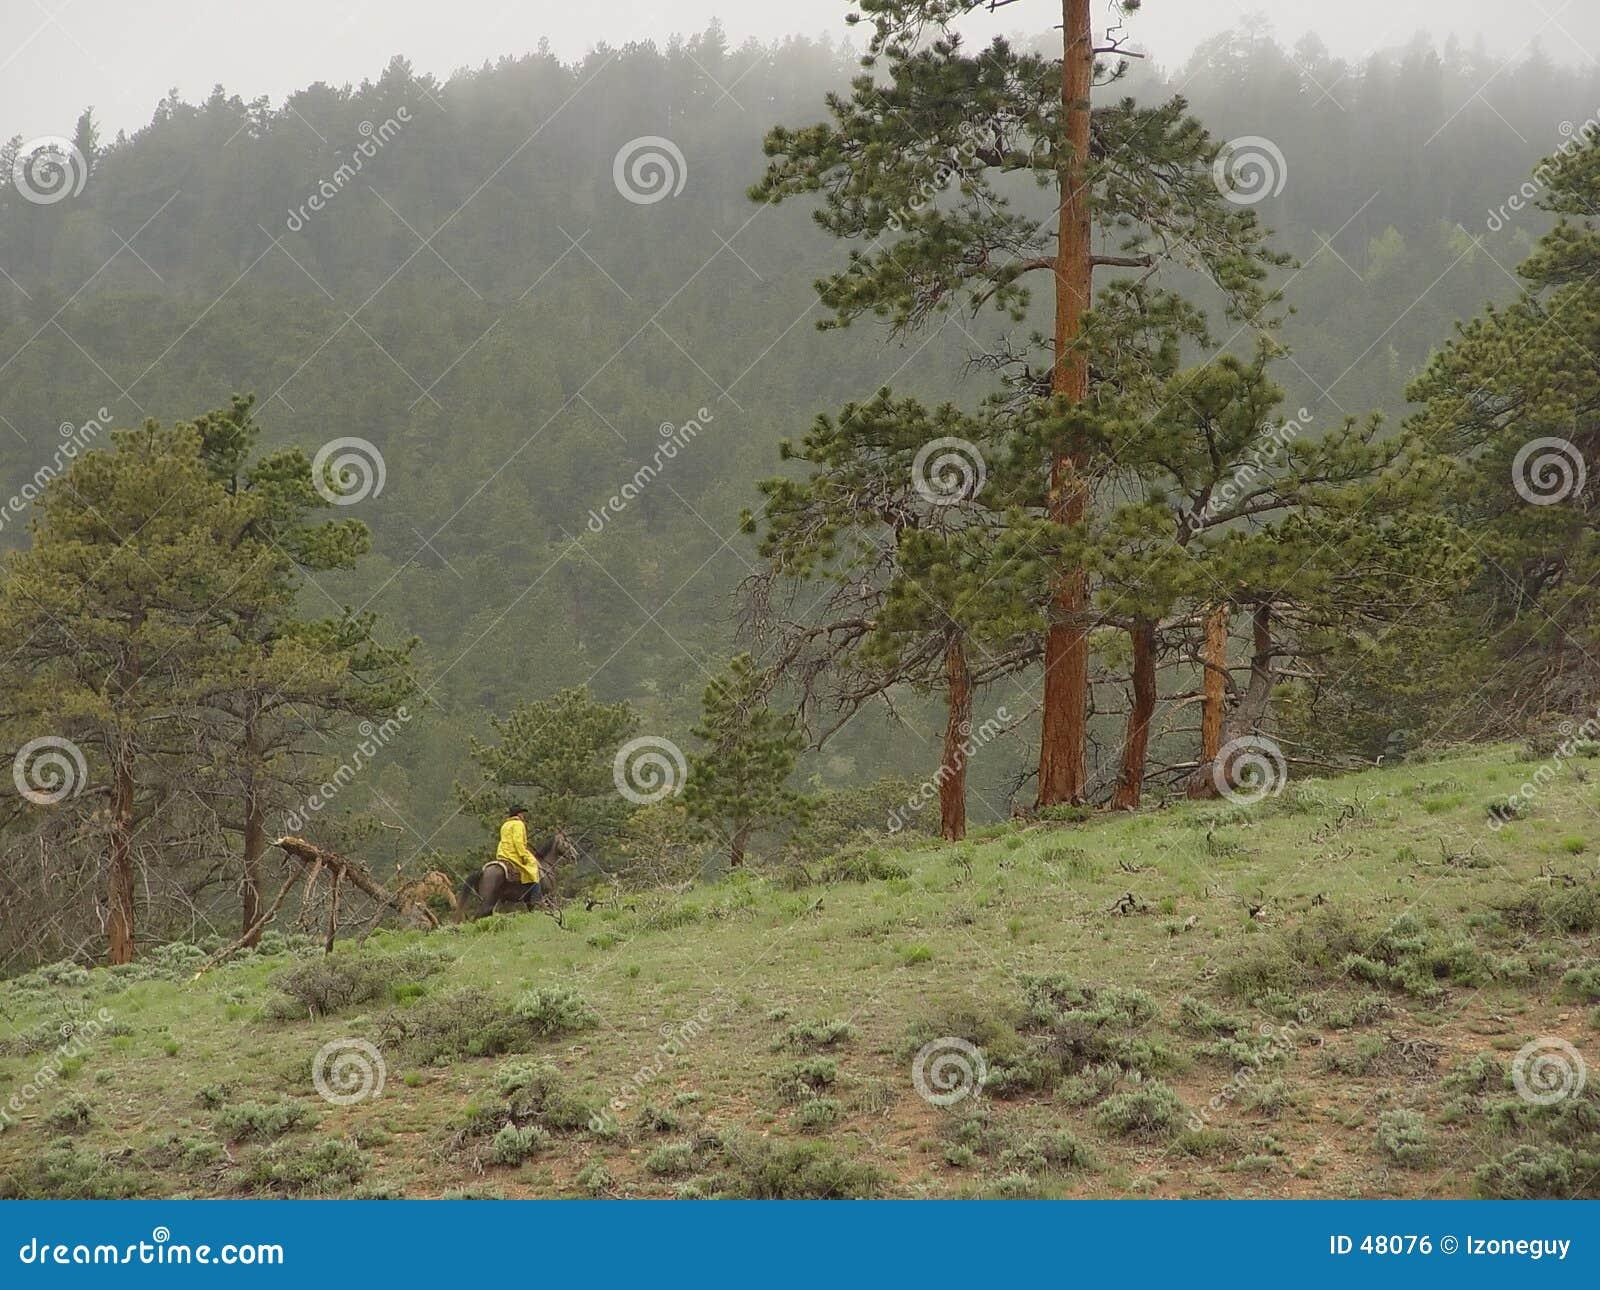 Pferderuecken-Mitfahrer in den Bergen